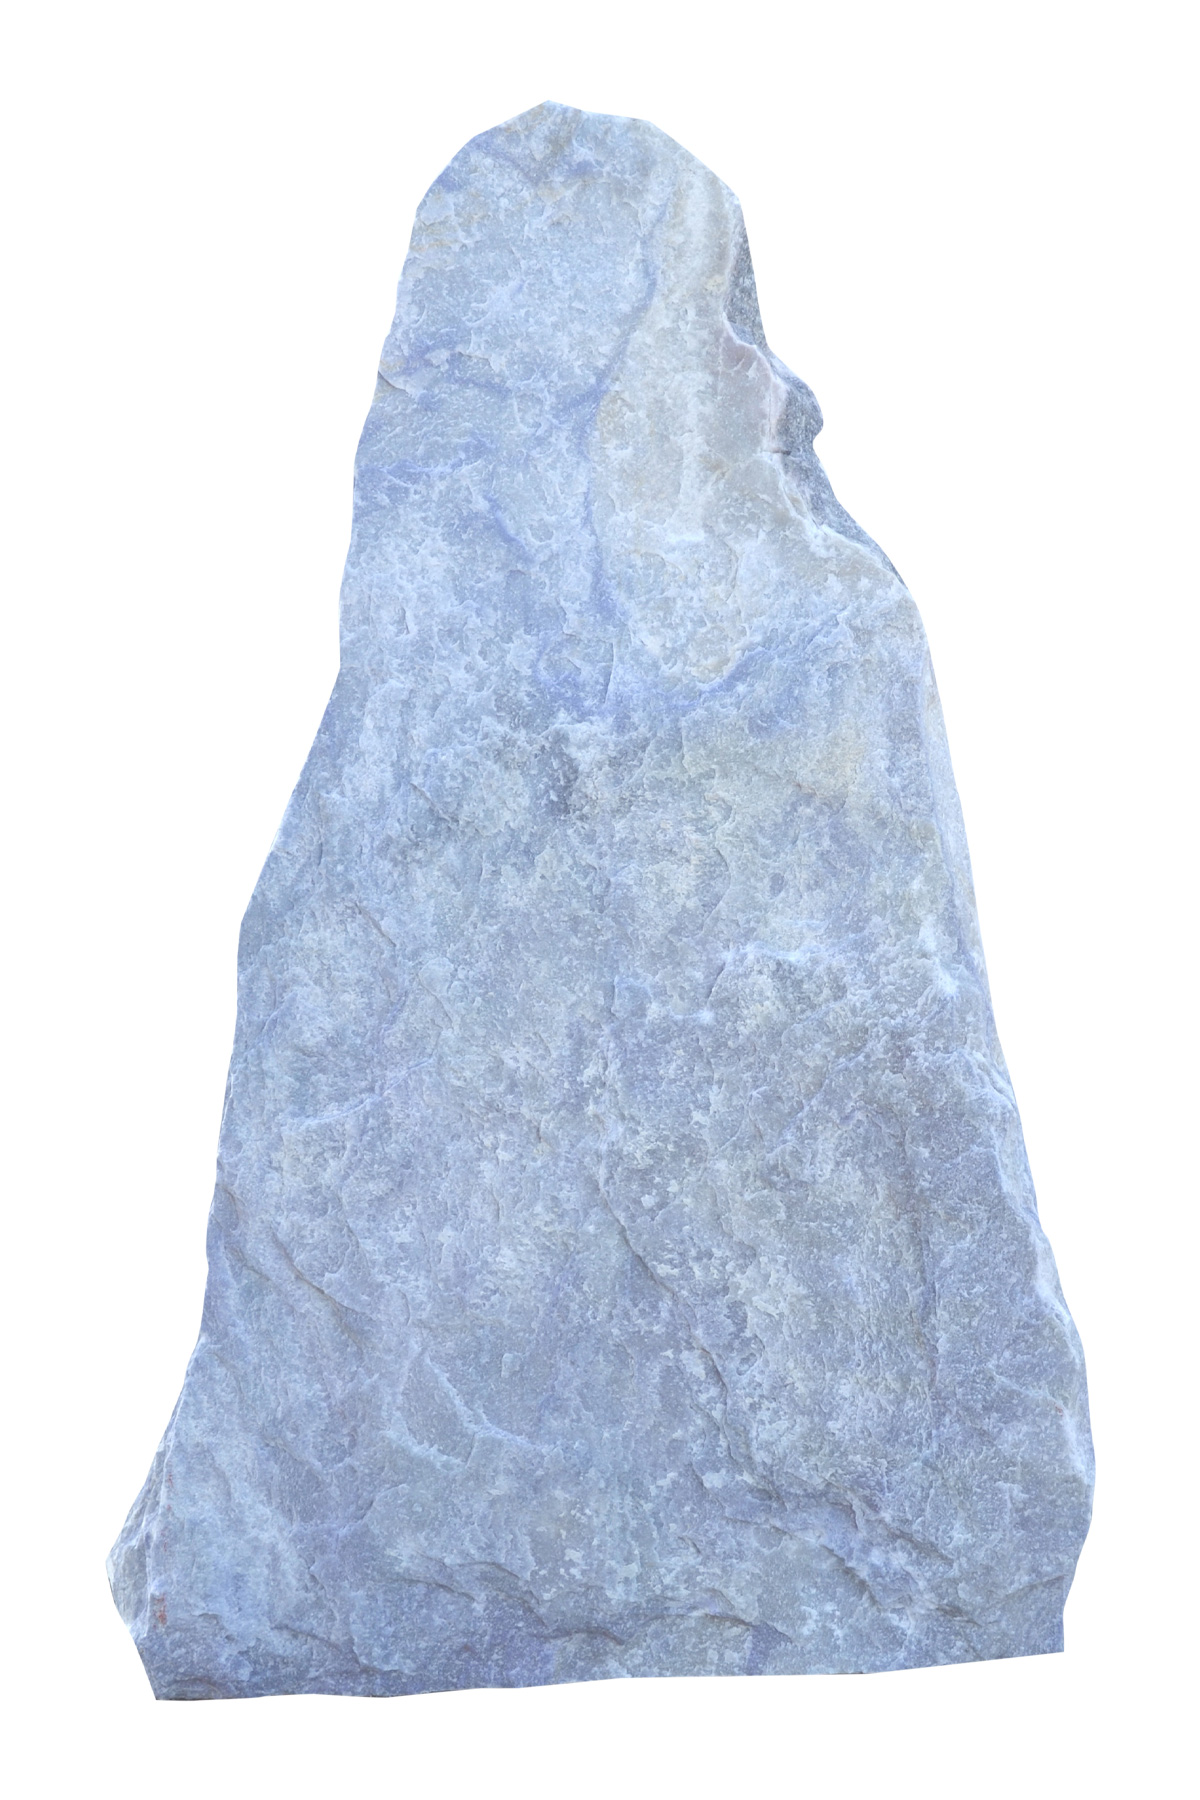 Azul gespalten